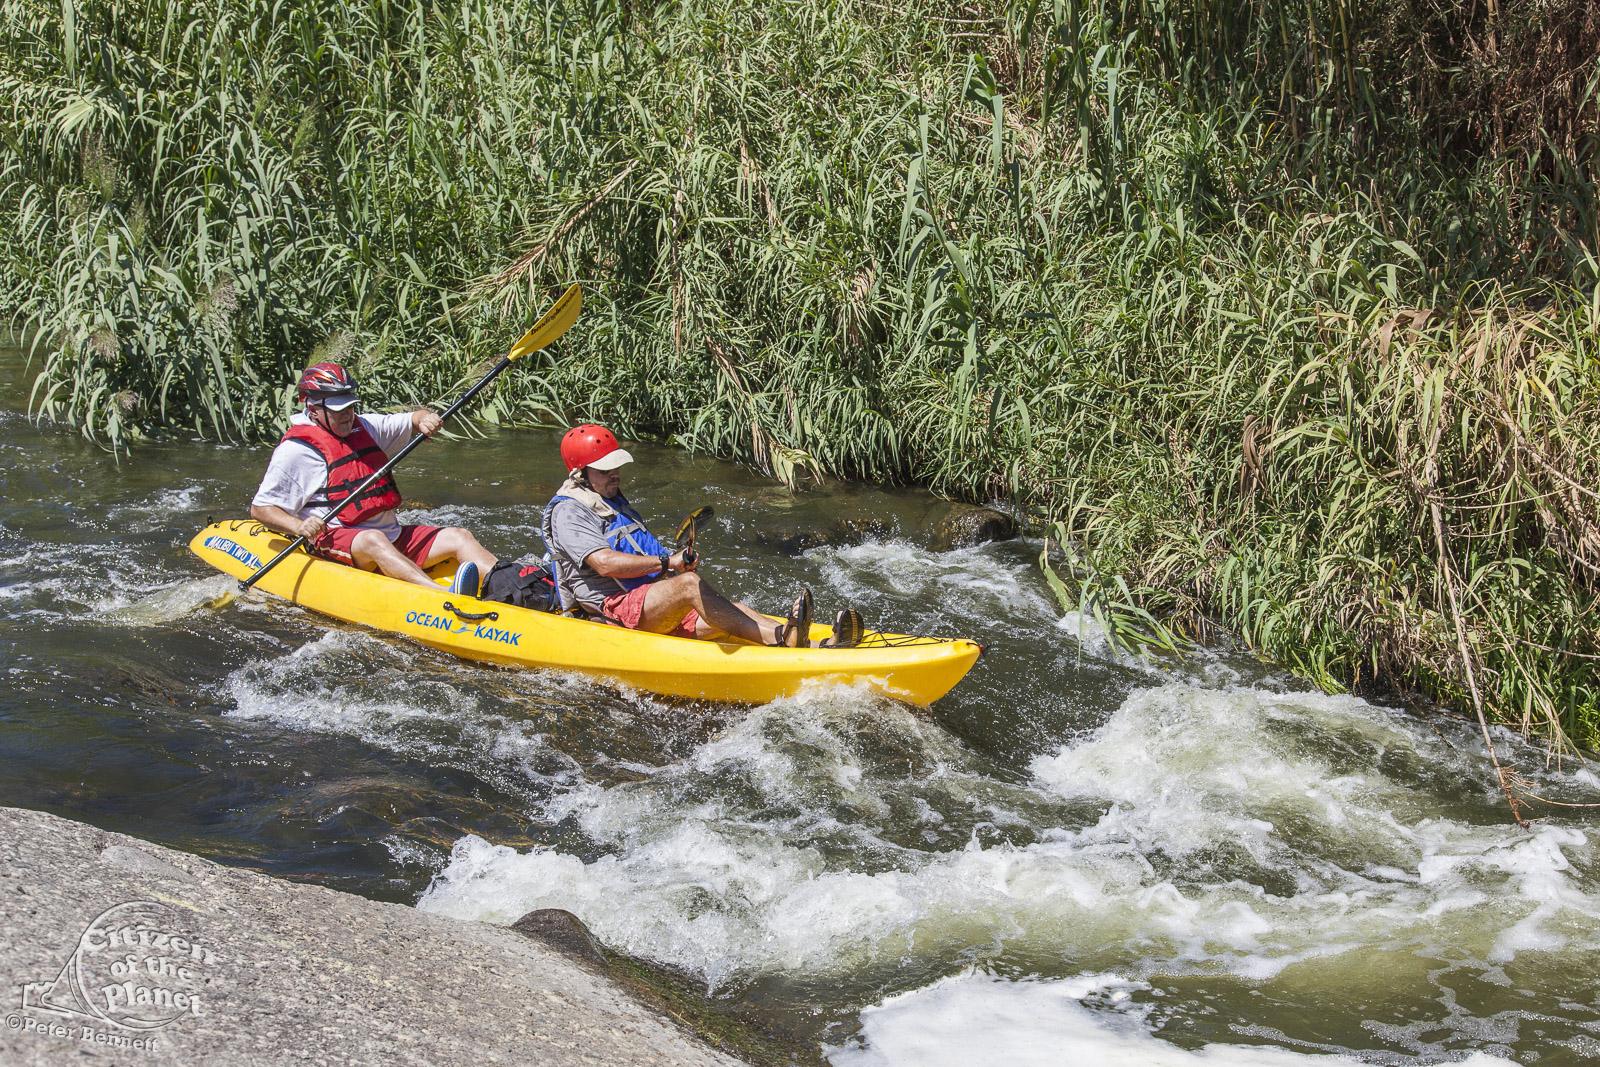 US_CA_48_3873_la_river_boat_race.jpg